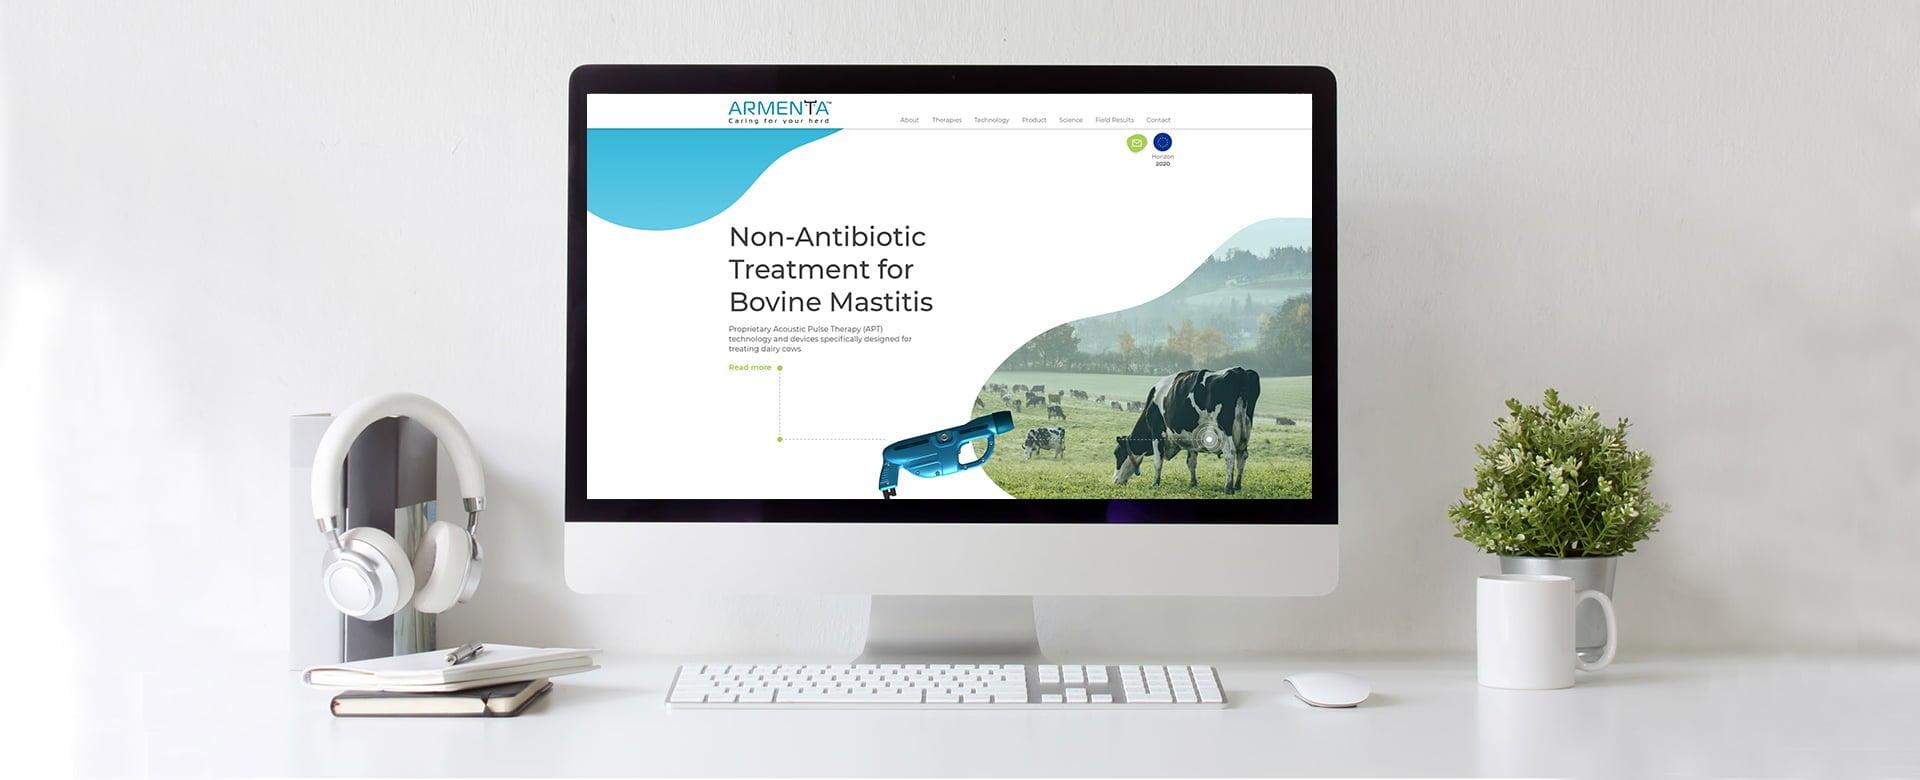 Armenta Website 1